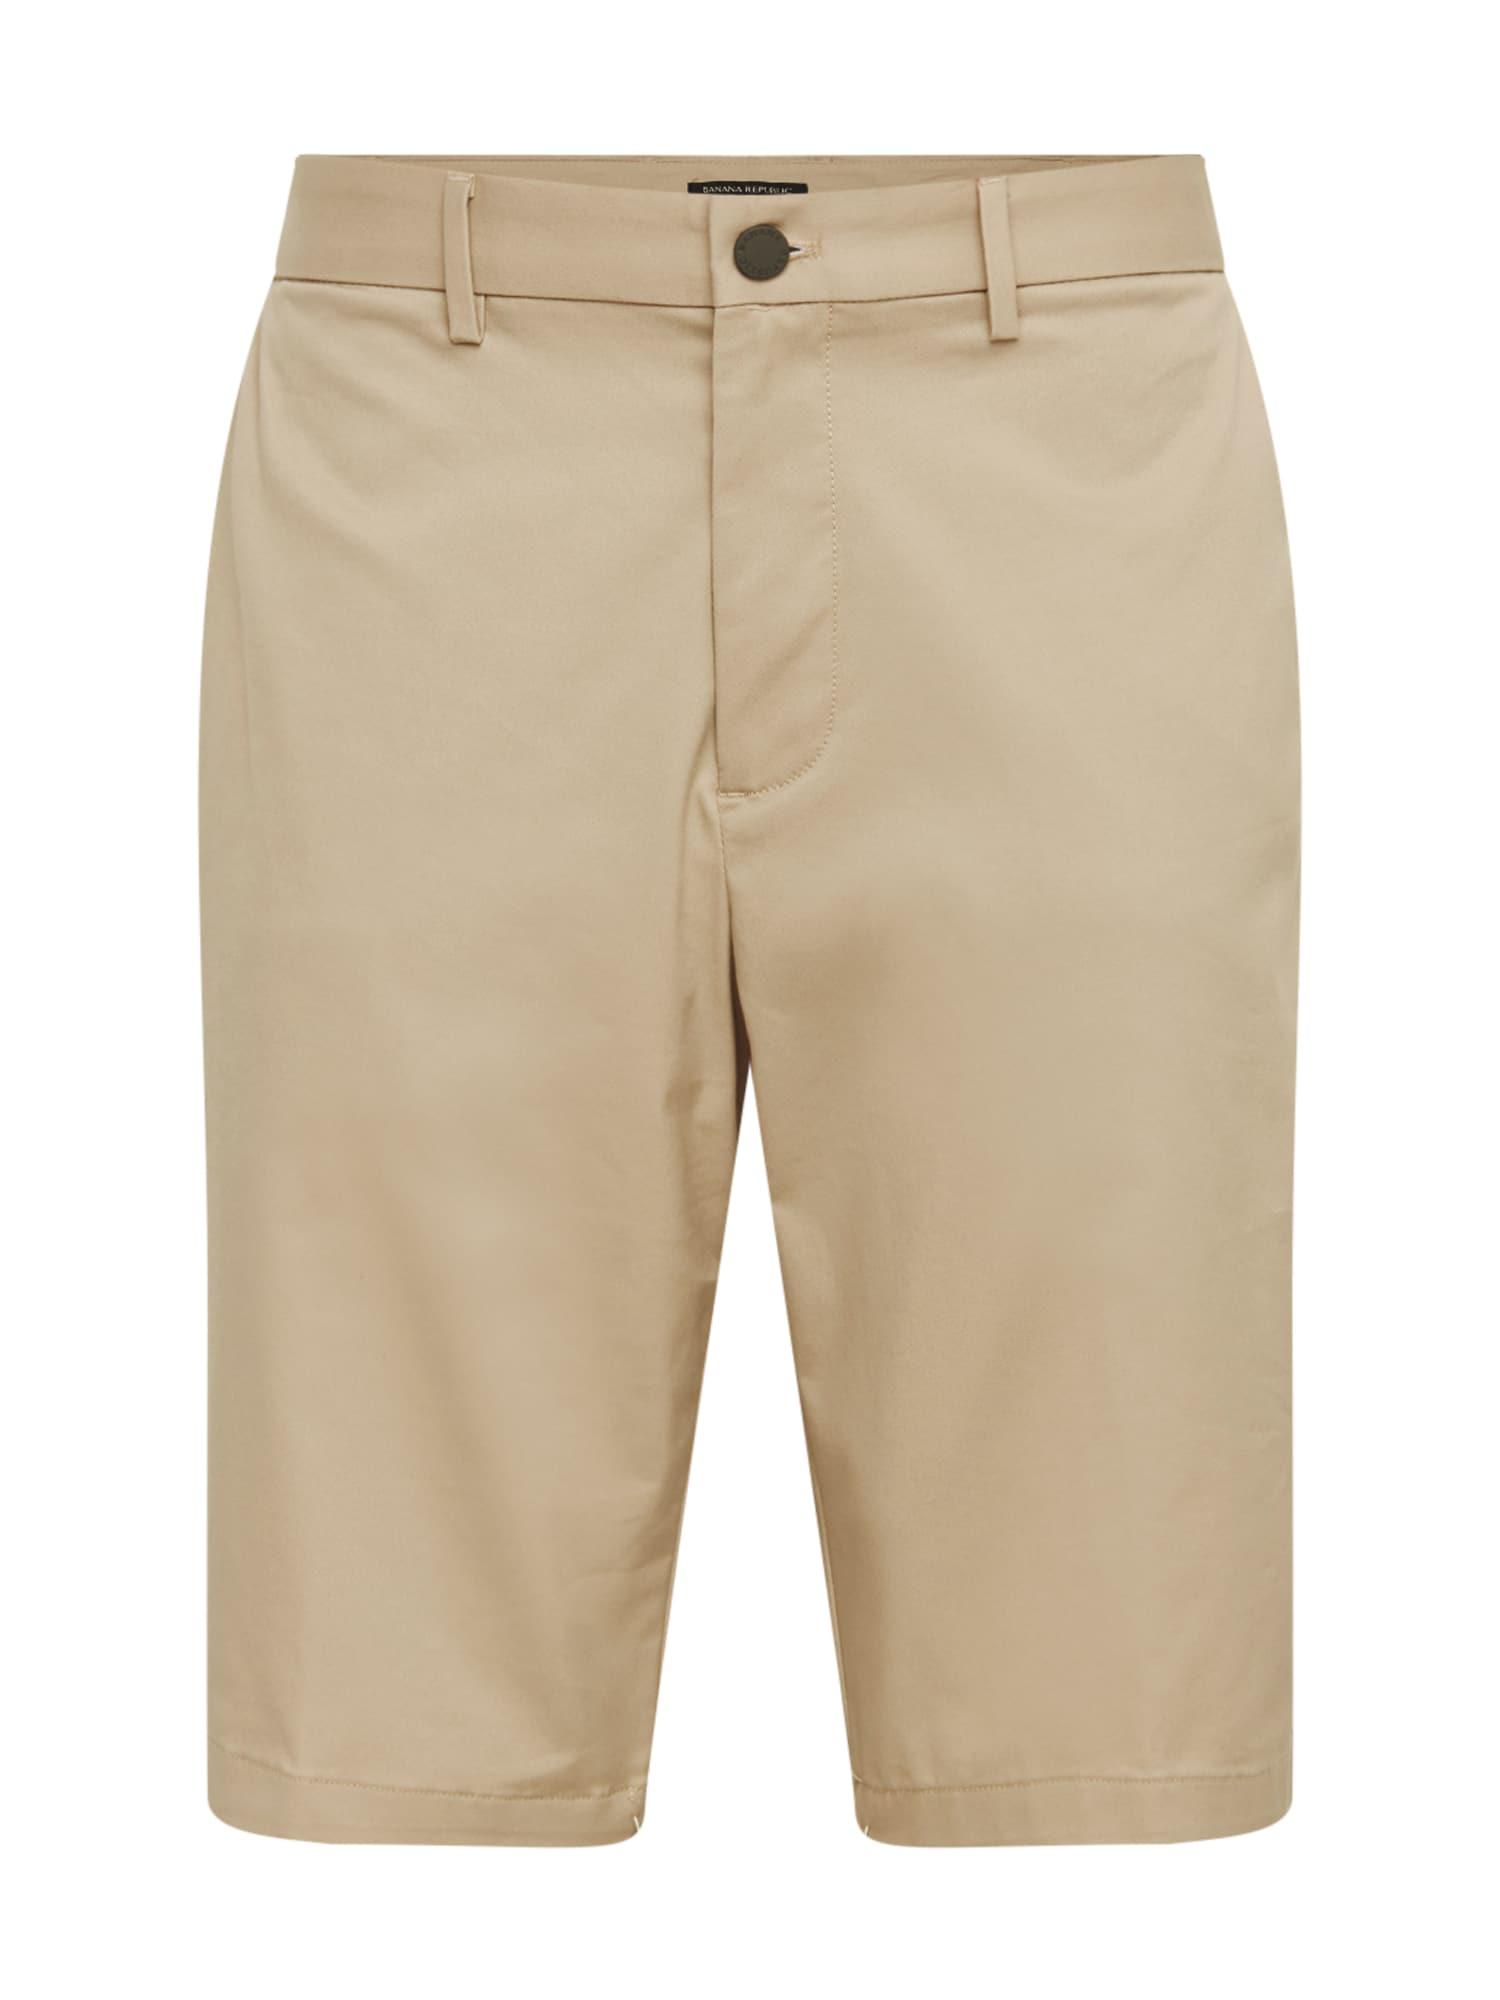 Chino kalhoty EMERSON 11 khaki Banana Republic